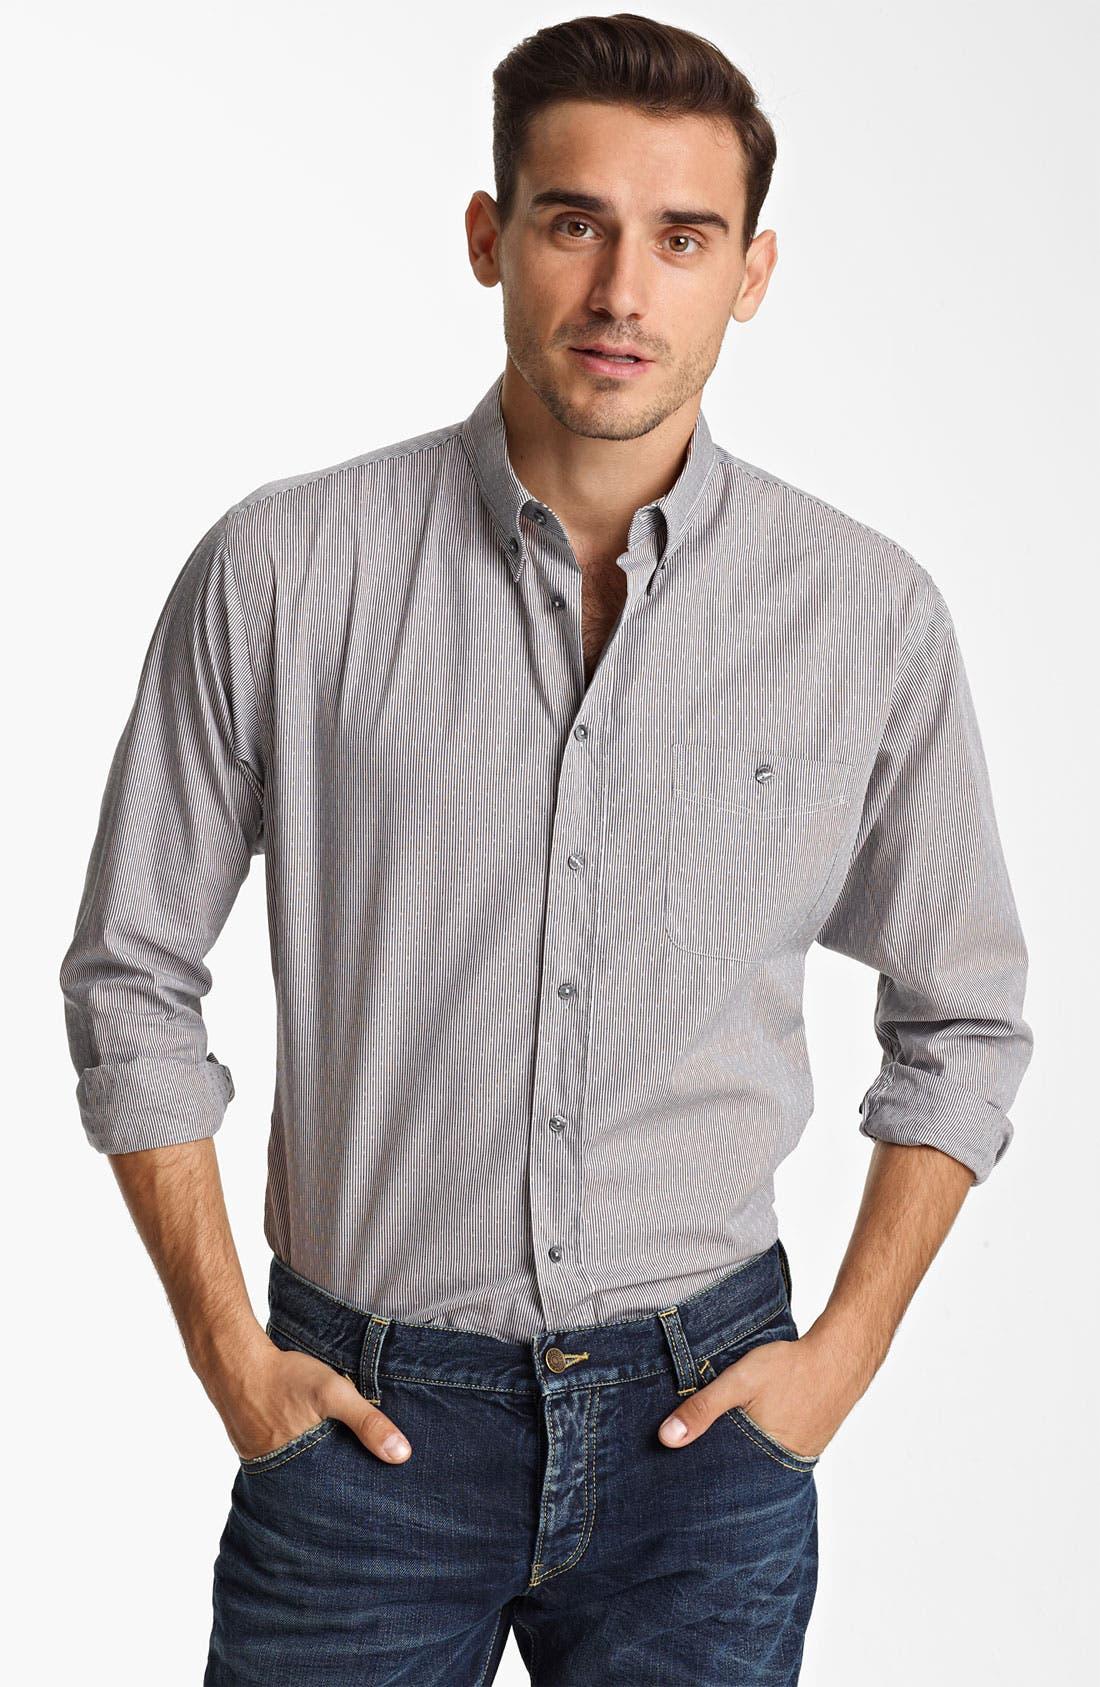 Alternate Image 1 Selected - Dolce&Gabbana Microstripe Woven Shirt